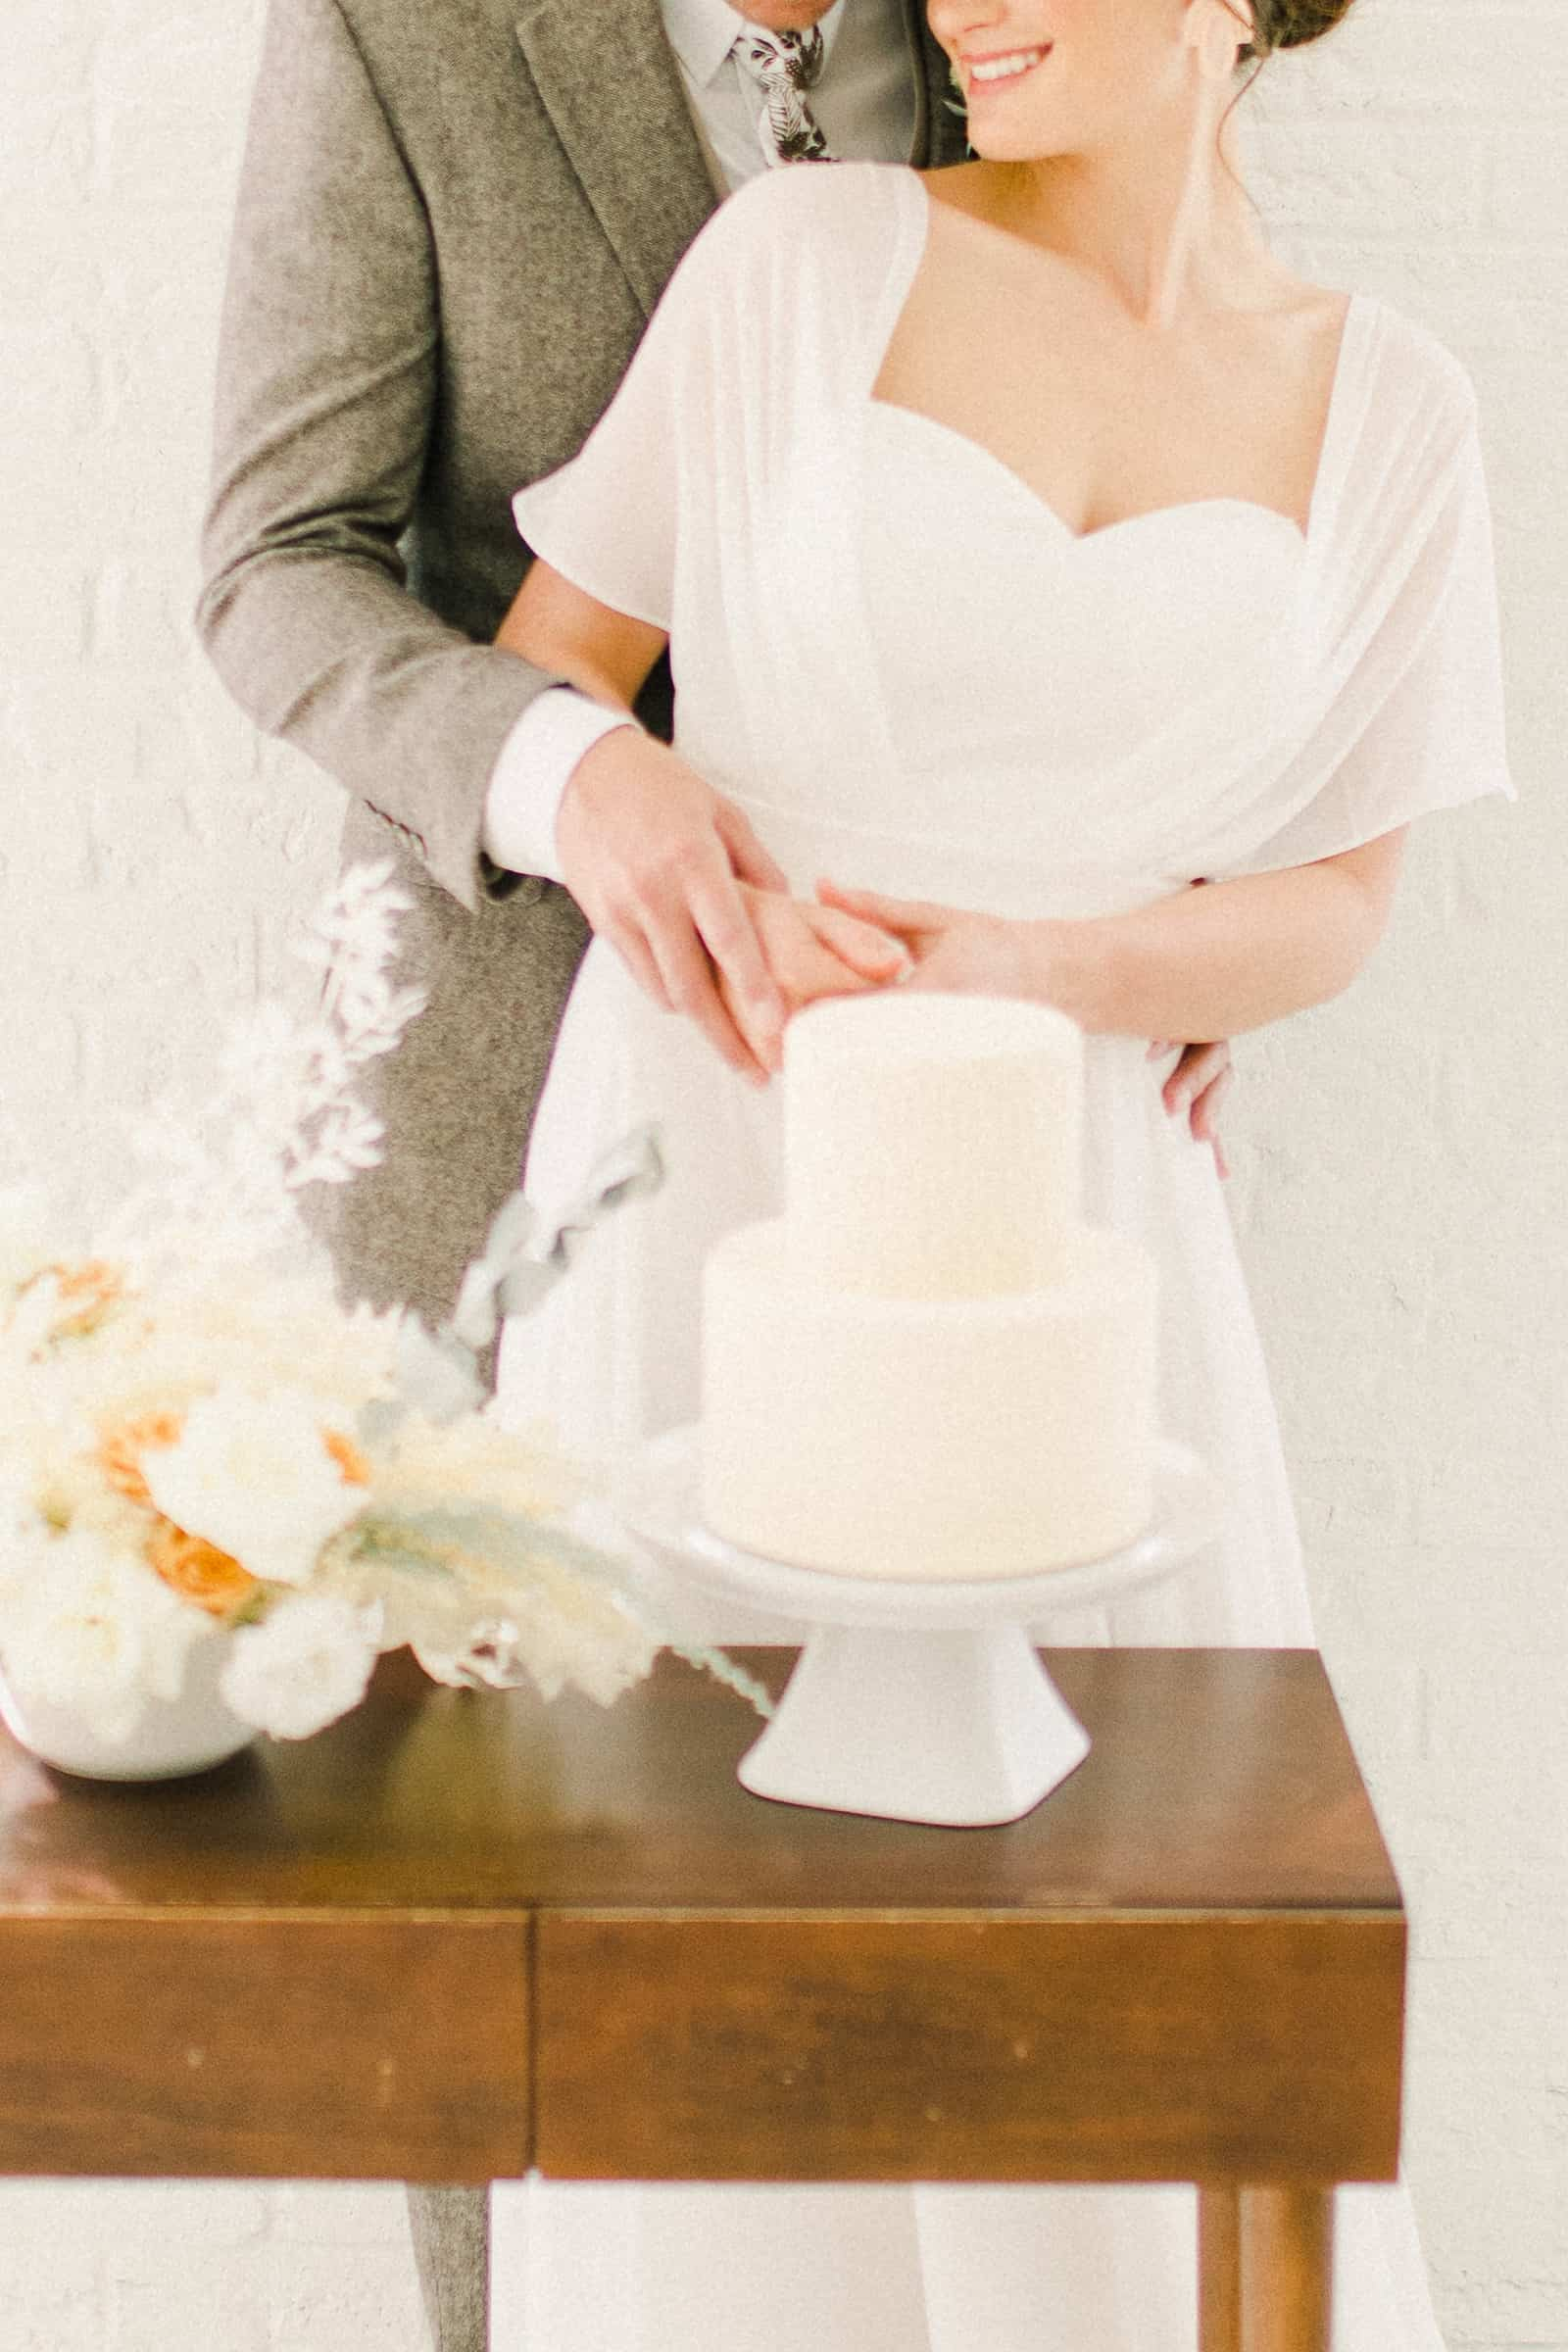 Bride and groom cut the cake, Modern minimalist white wedding cake with geometric design